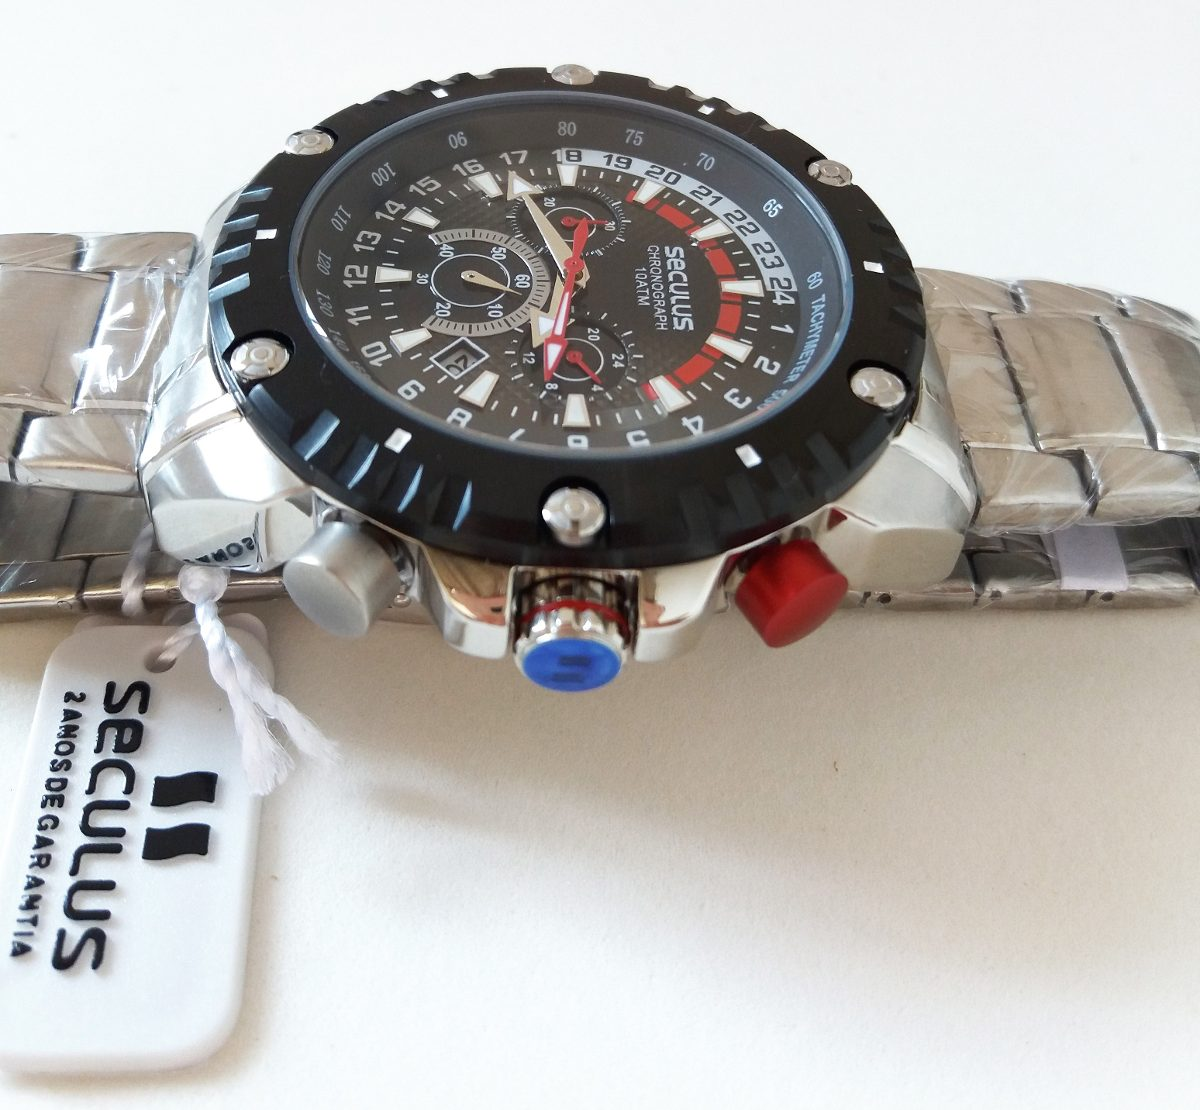 5880325bf75 Carregando zoom... relógio seculus barato cronometro analogico masculino